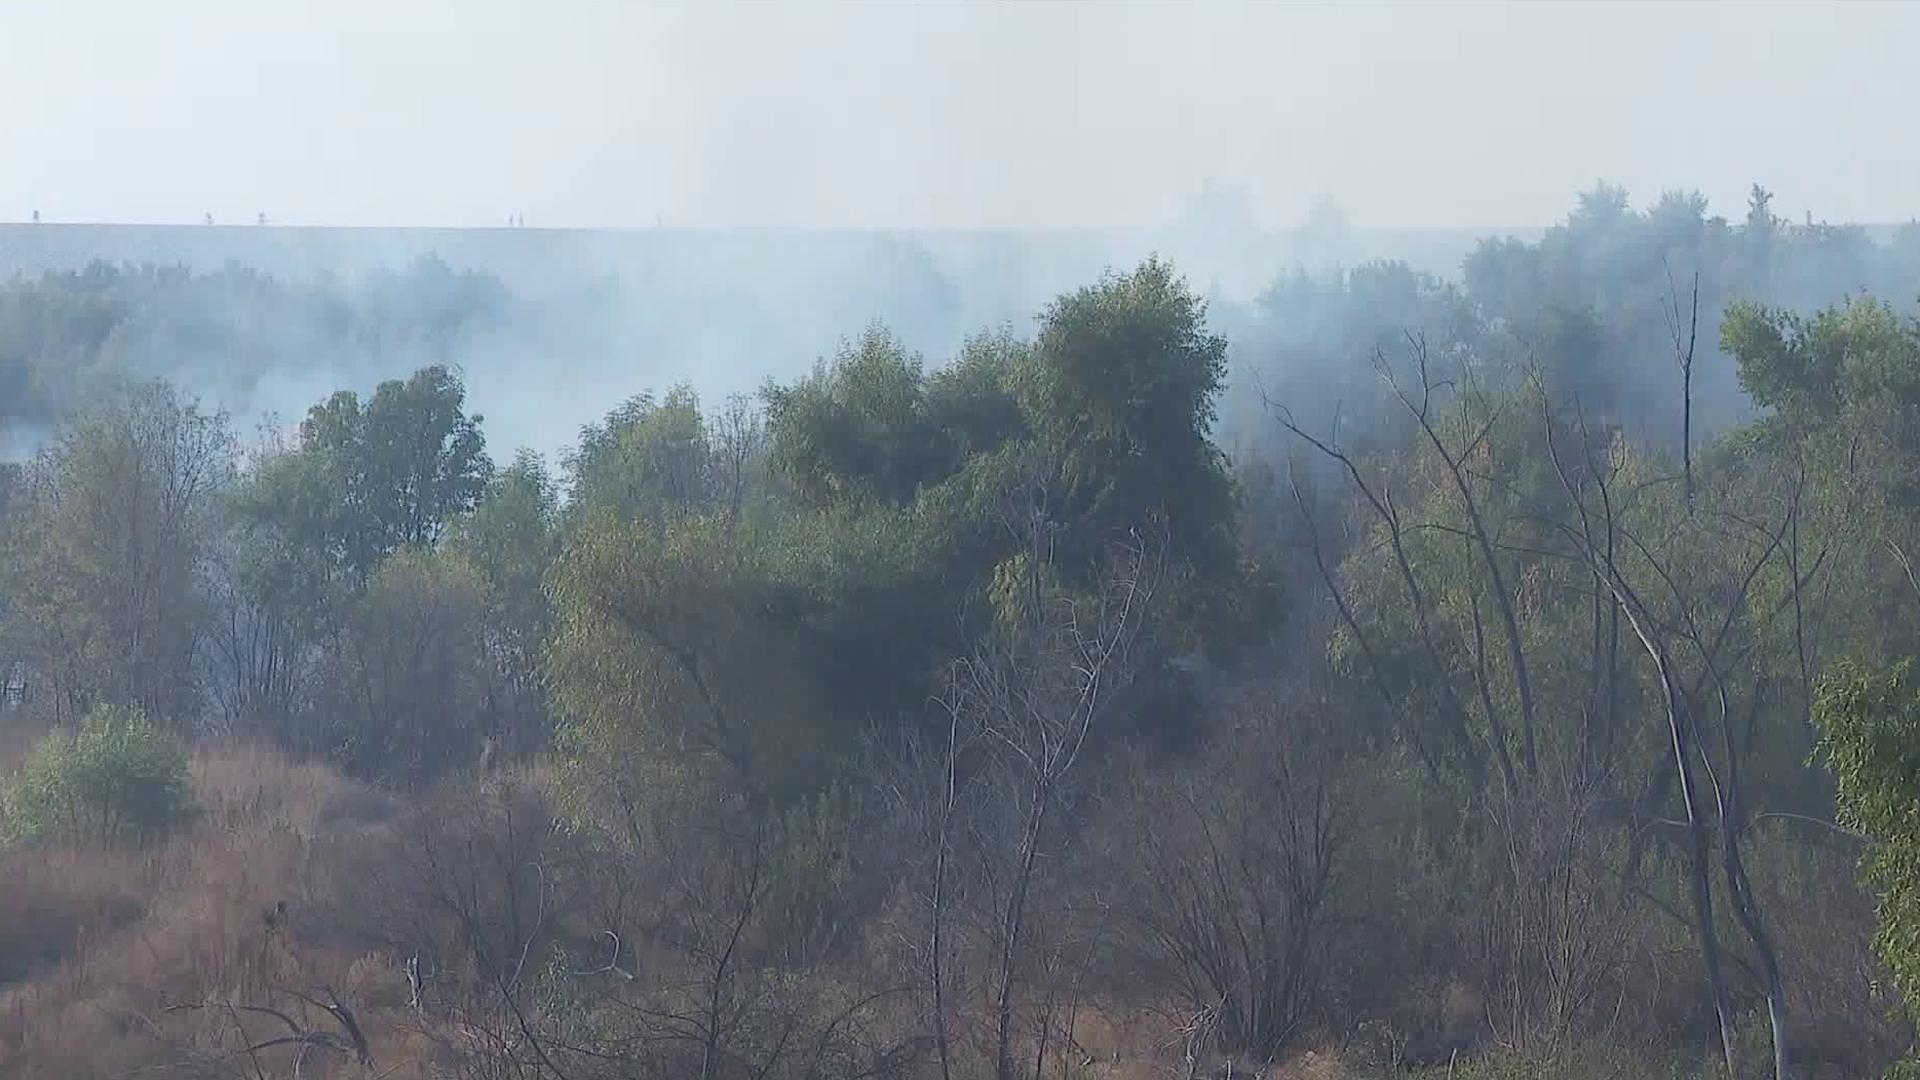 A brush fire burns in Hansen Dam on Nov. 11, 2019. (Credit: KTLA)